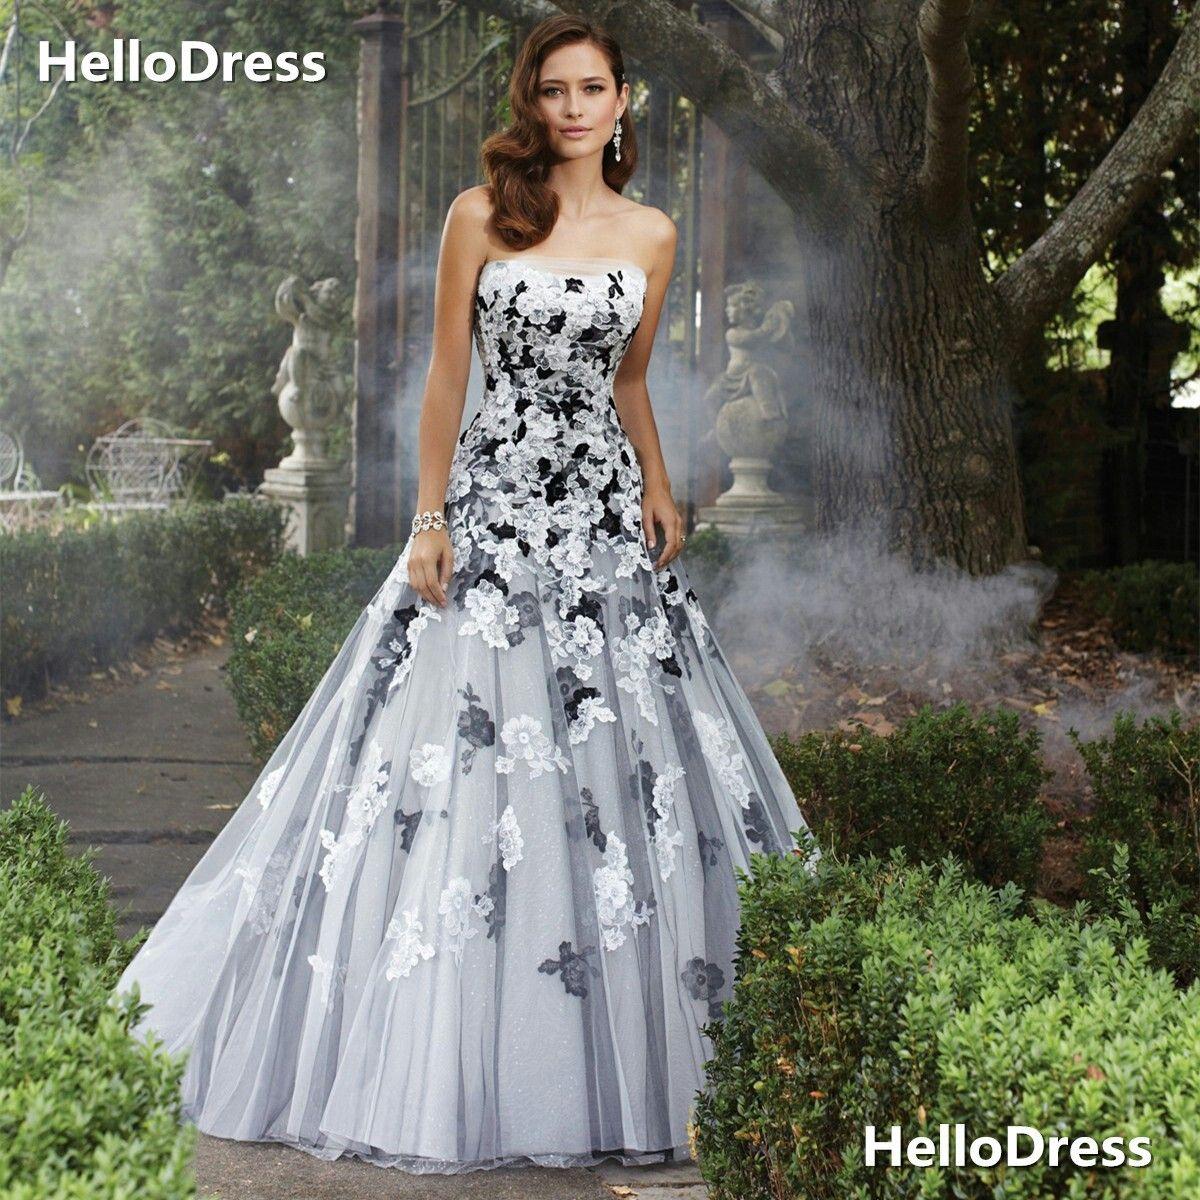 Best Black Wedding Outfits Ideas - Wedding Ideas - memiocall.com